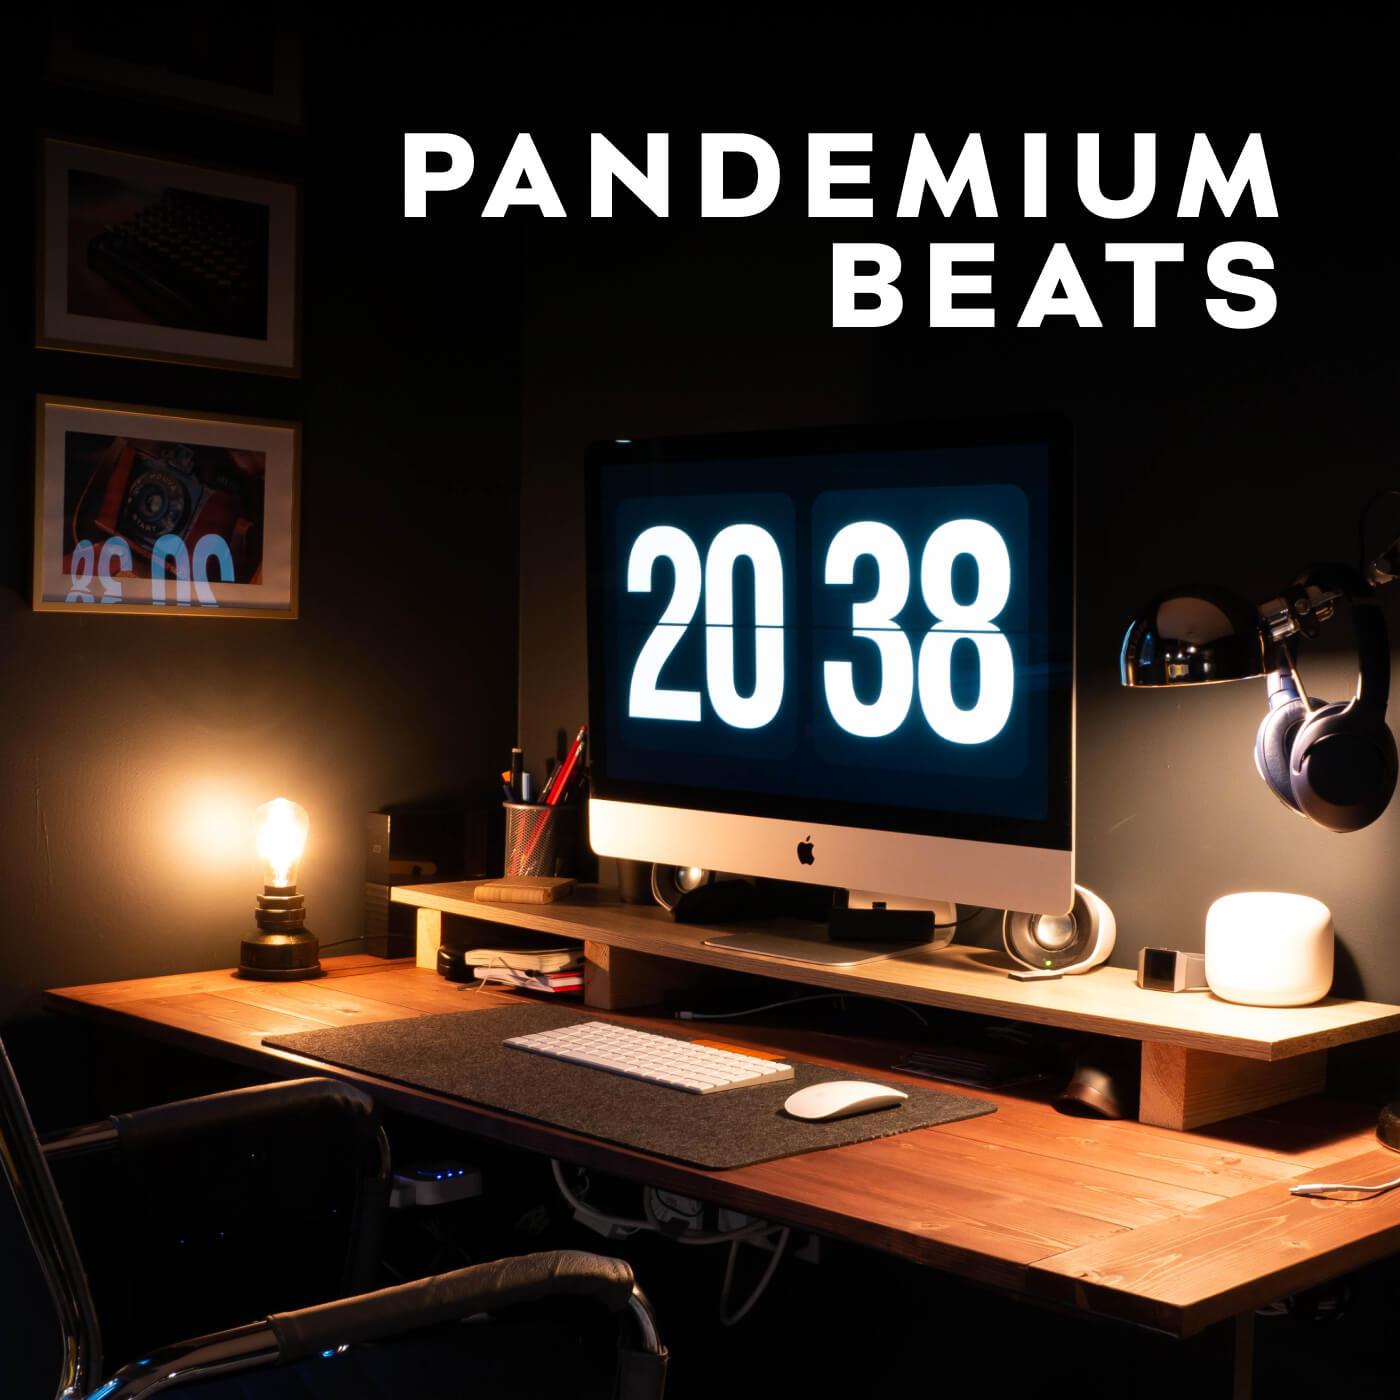 Okładka playlisty Pandem ium Beats na spotify